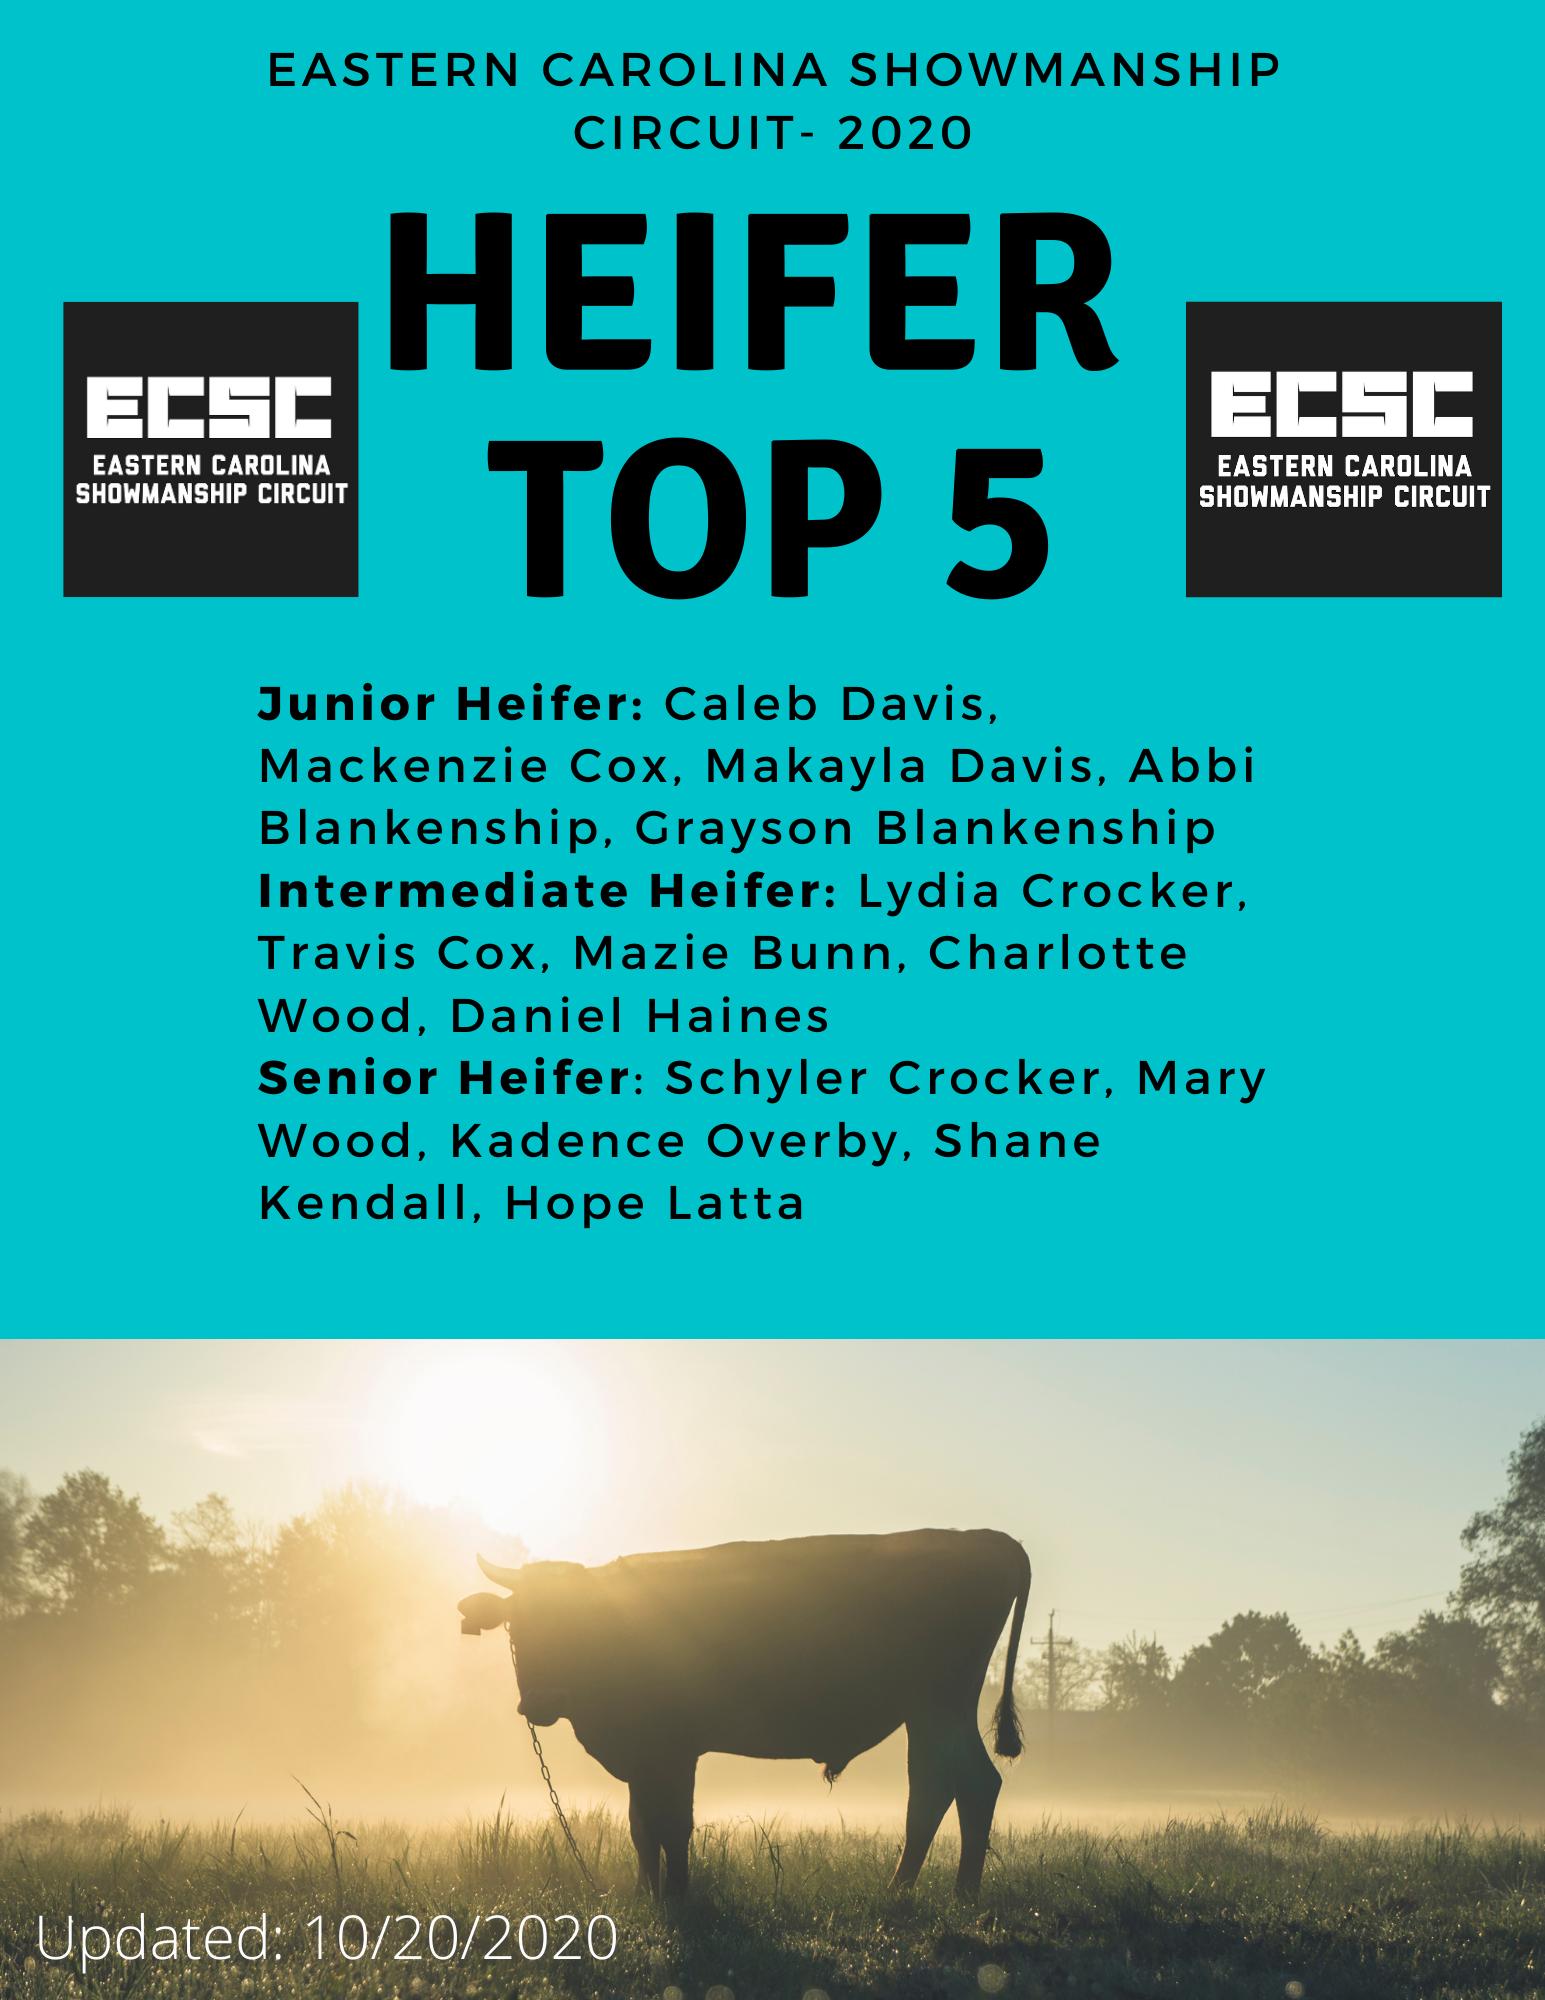 Heifer top 5